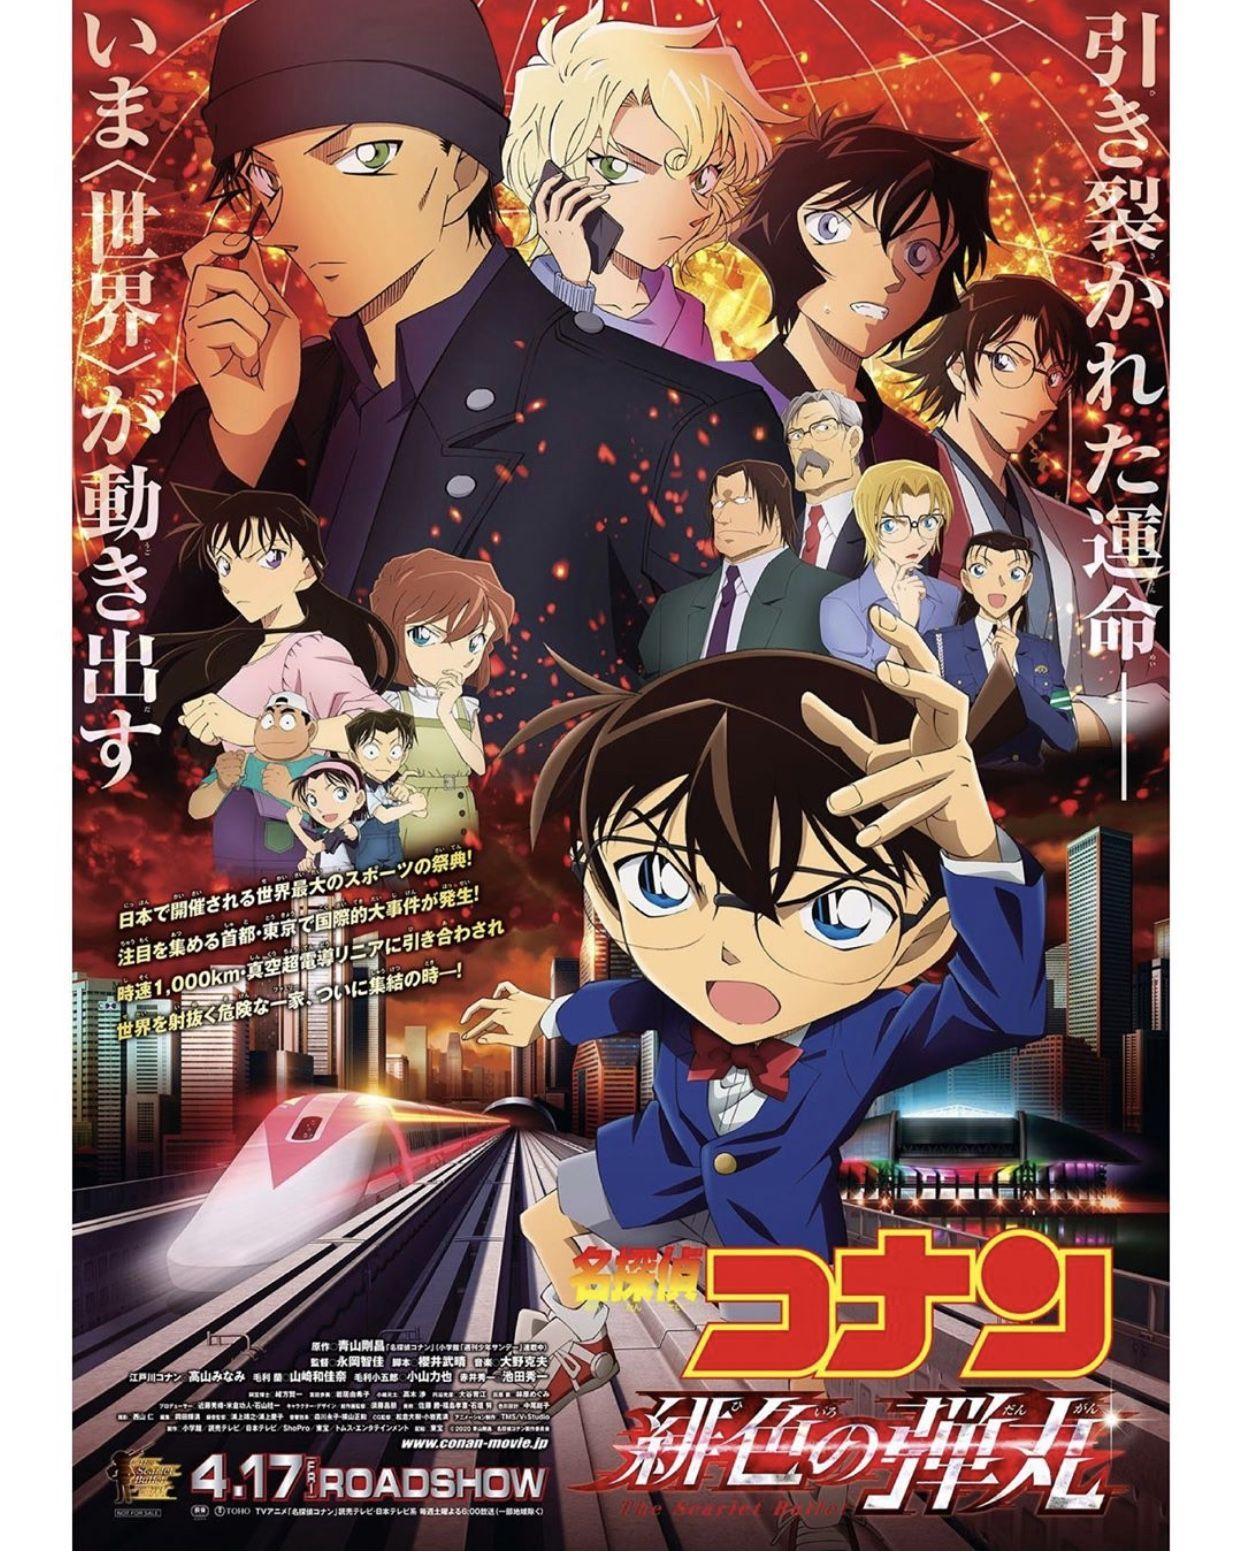 Pin by Reham on Detective conan in 2020 Conan movie